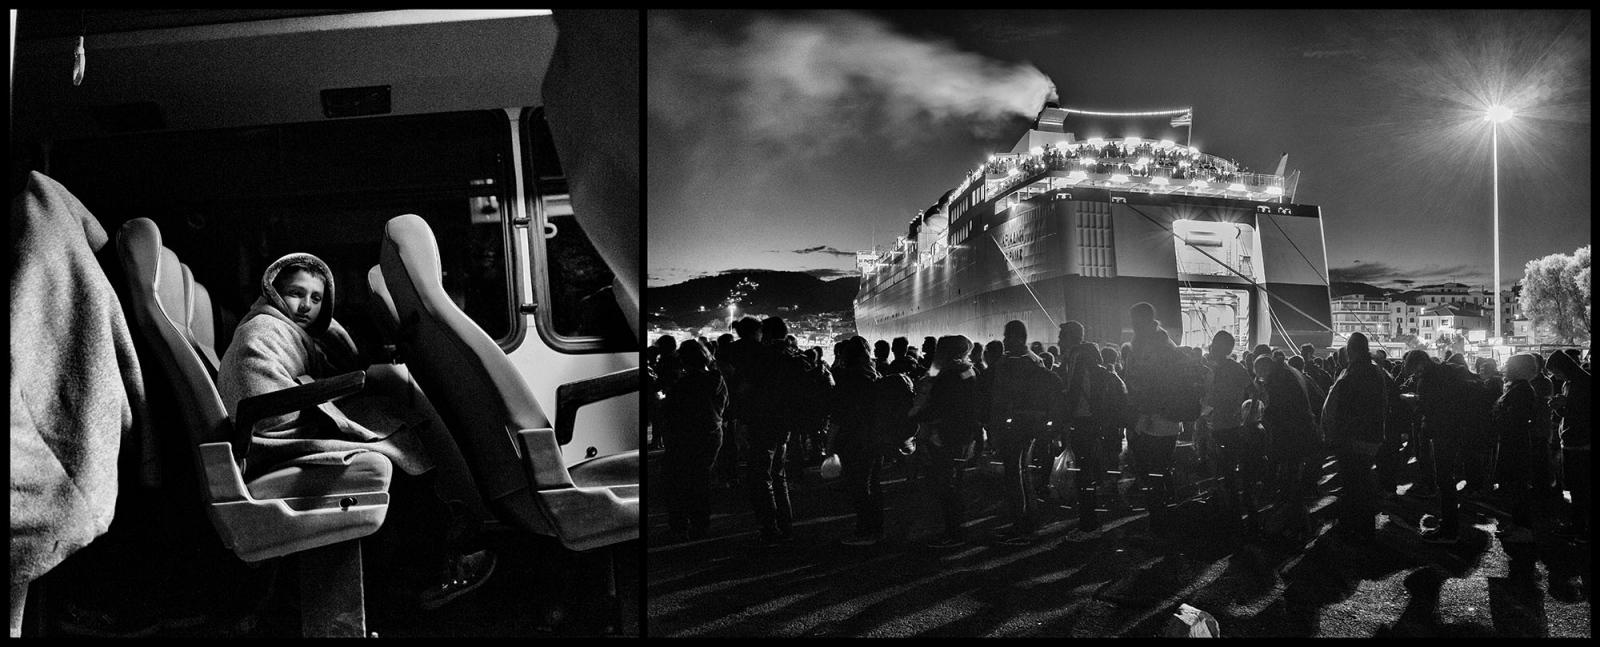 Art and Documentary Photography - Loading Nikos_Pilos_Stern_Goethe_institute_011.jpg